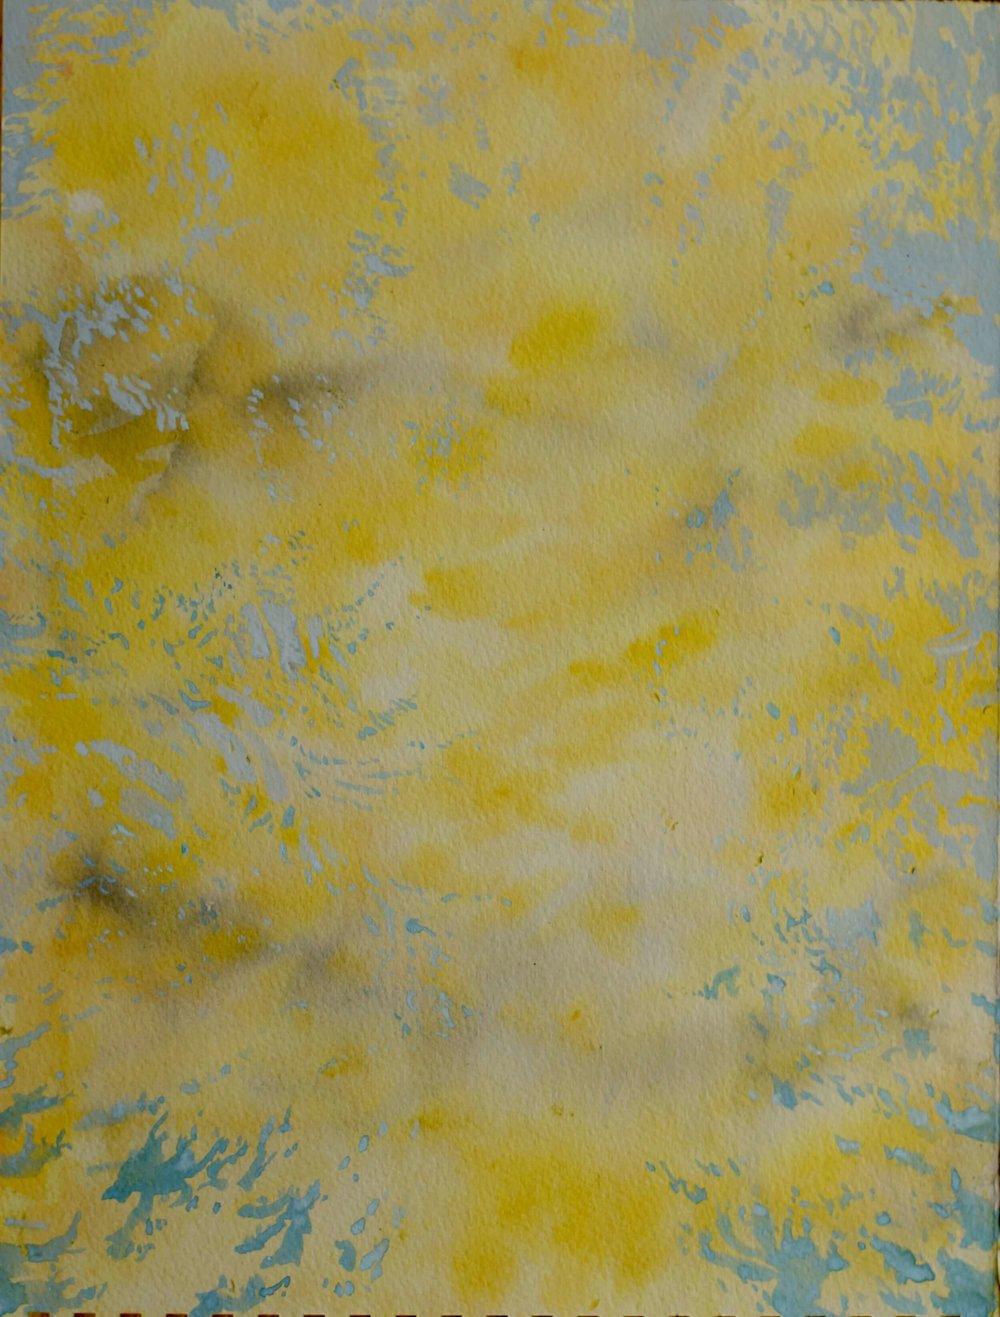 RHSK167 Listening to the Acacia ( Watercolour ) 37 x 28.5 cm